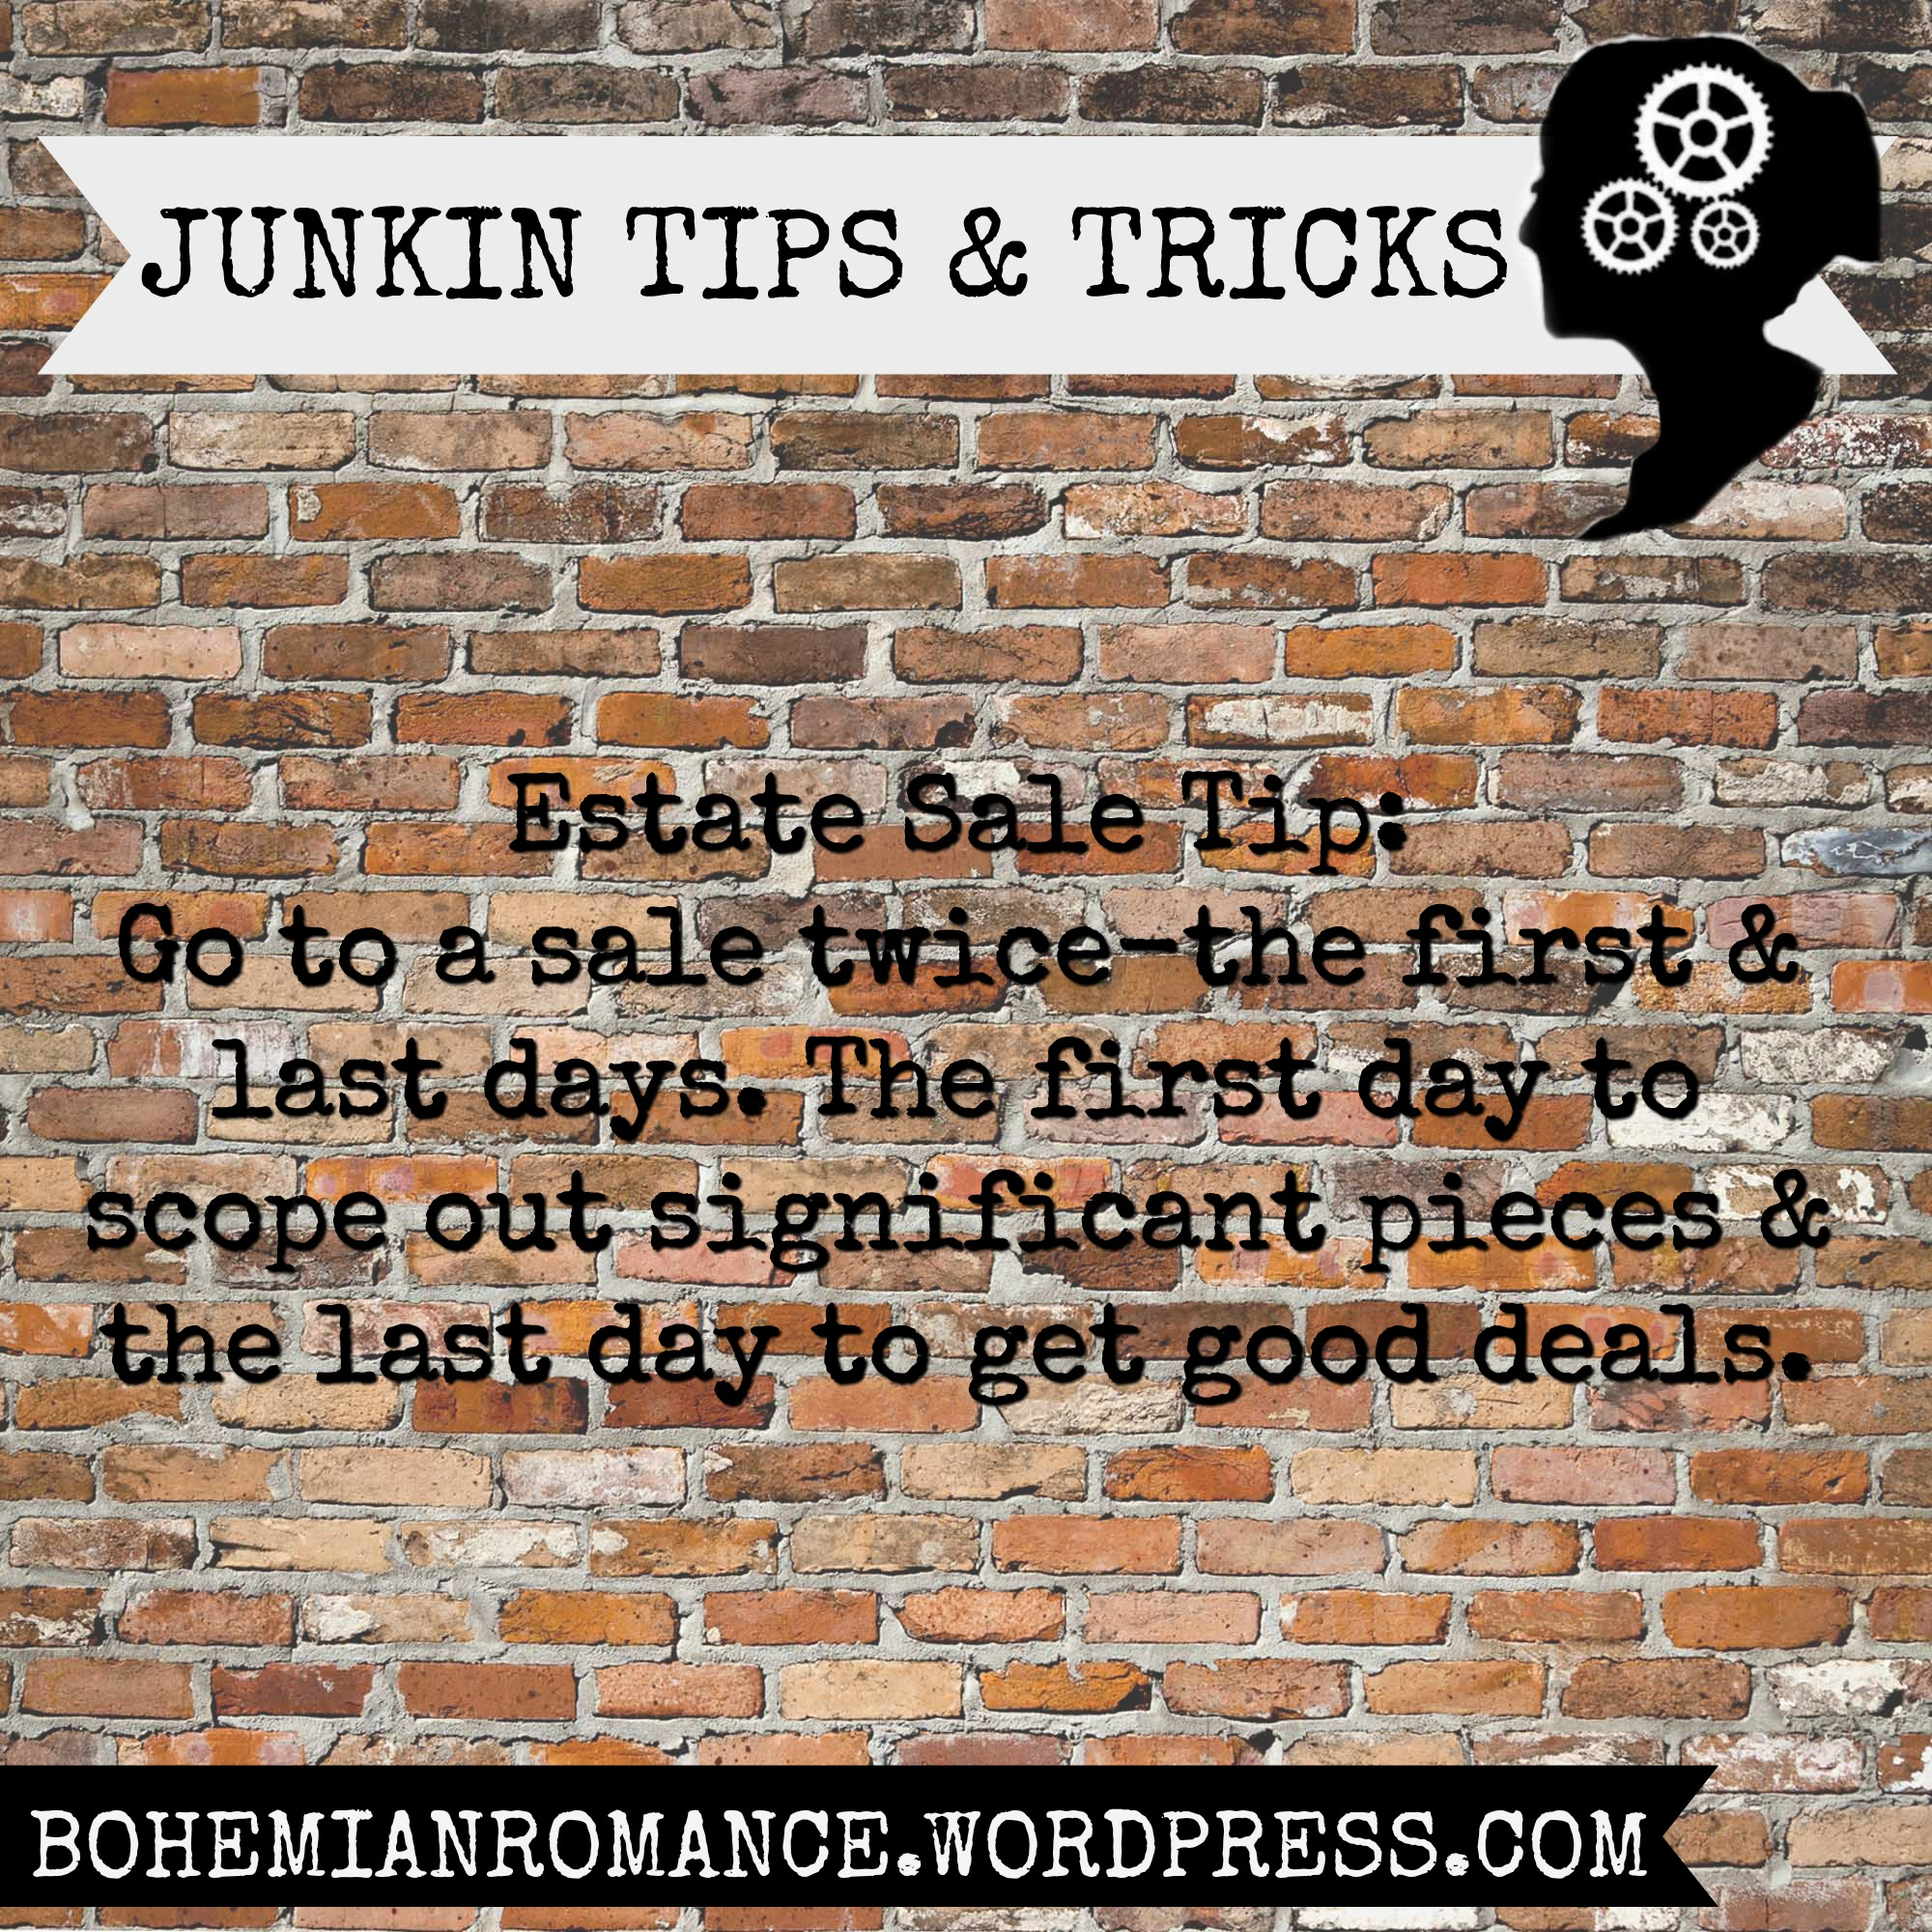 6-junkin-tips-tricks-template